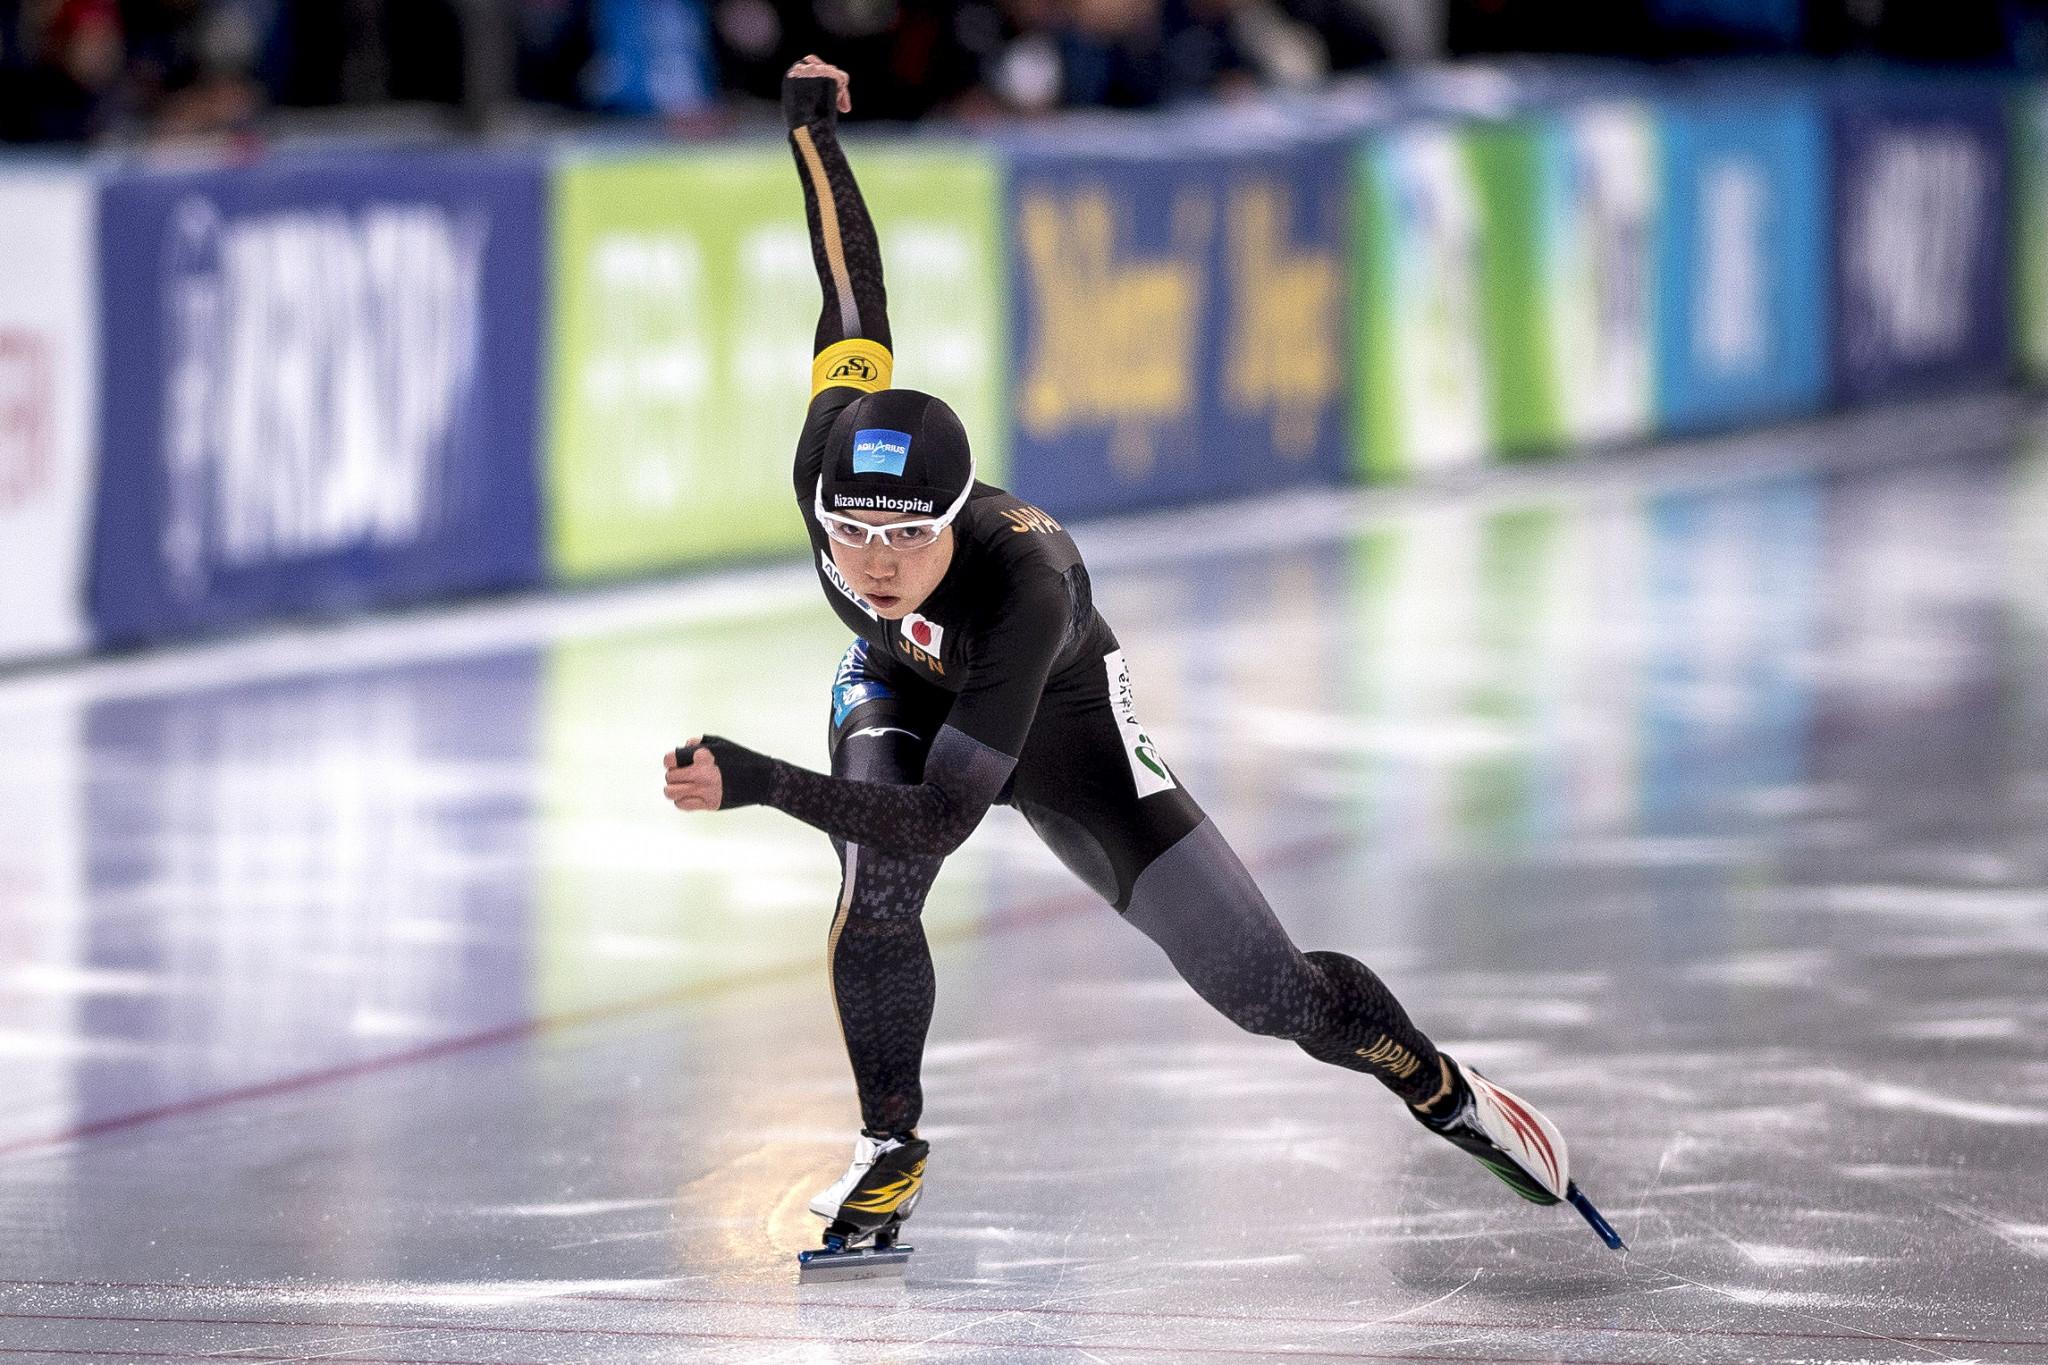 Kodaira hopes to maintain early season form at ISU Speed Skating World Cup in Calgary